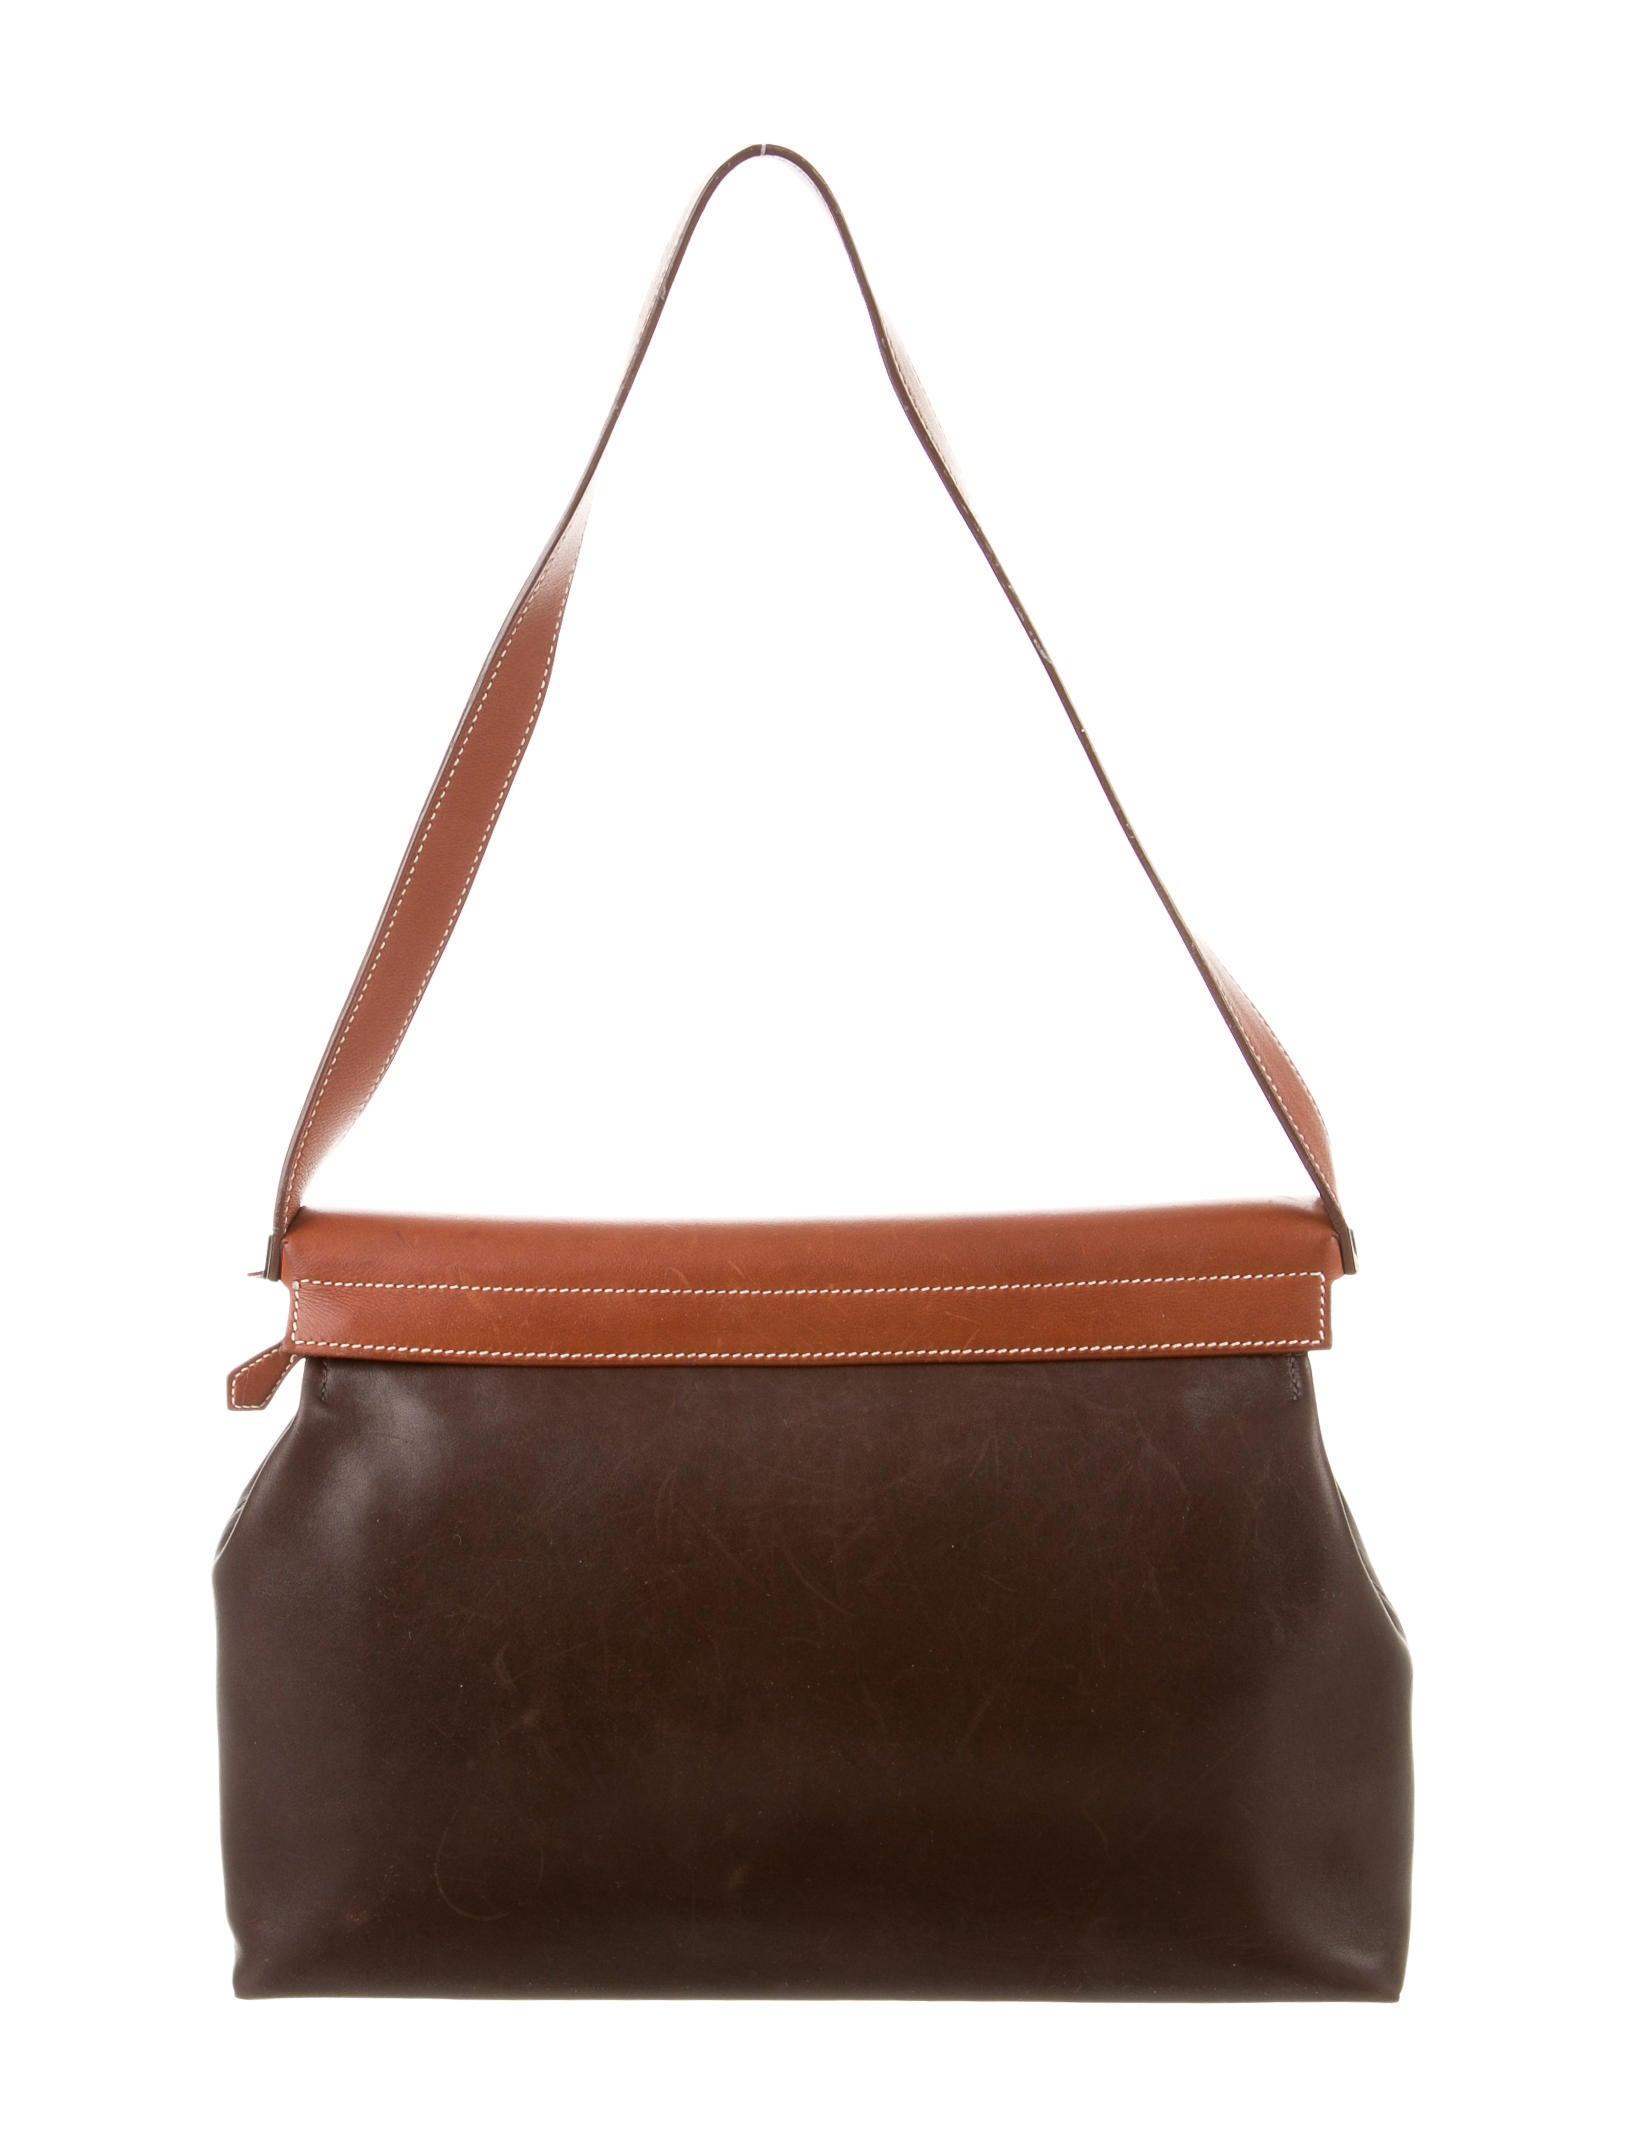 ... usa hermès yeoh bag handbags her55503 the realreal de8dd 2933c 833854b74de05